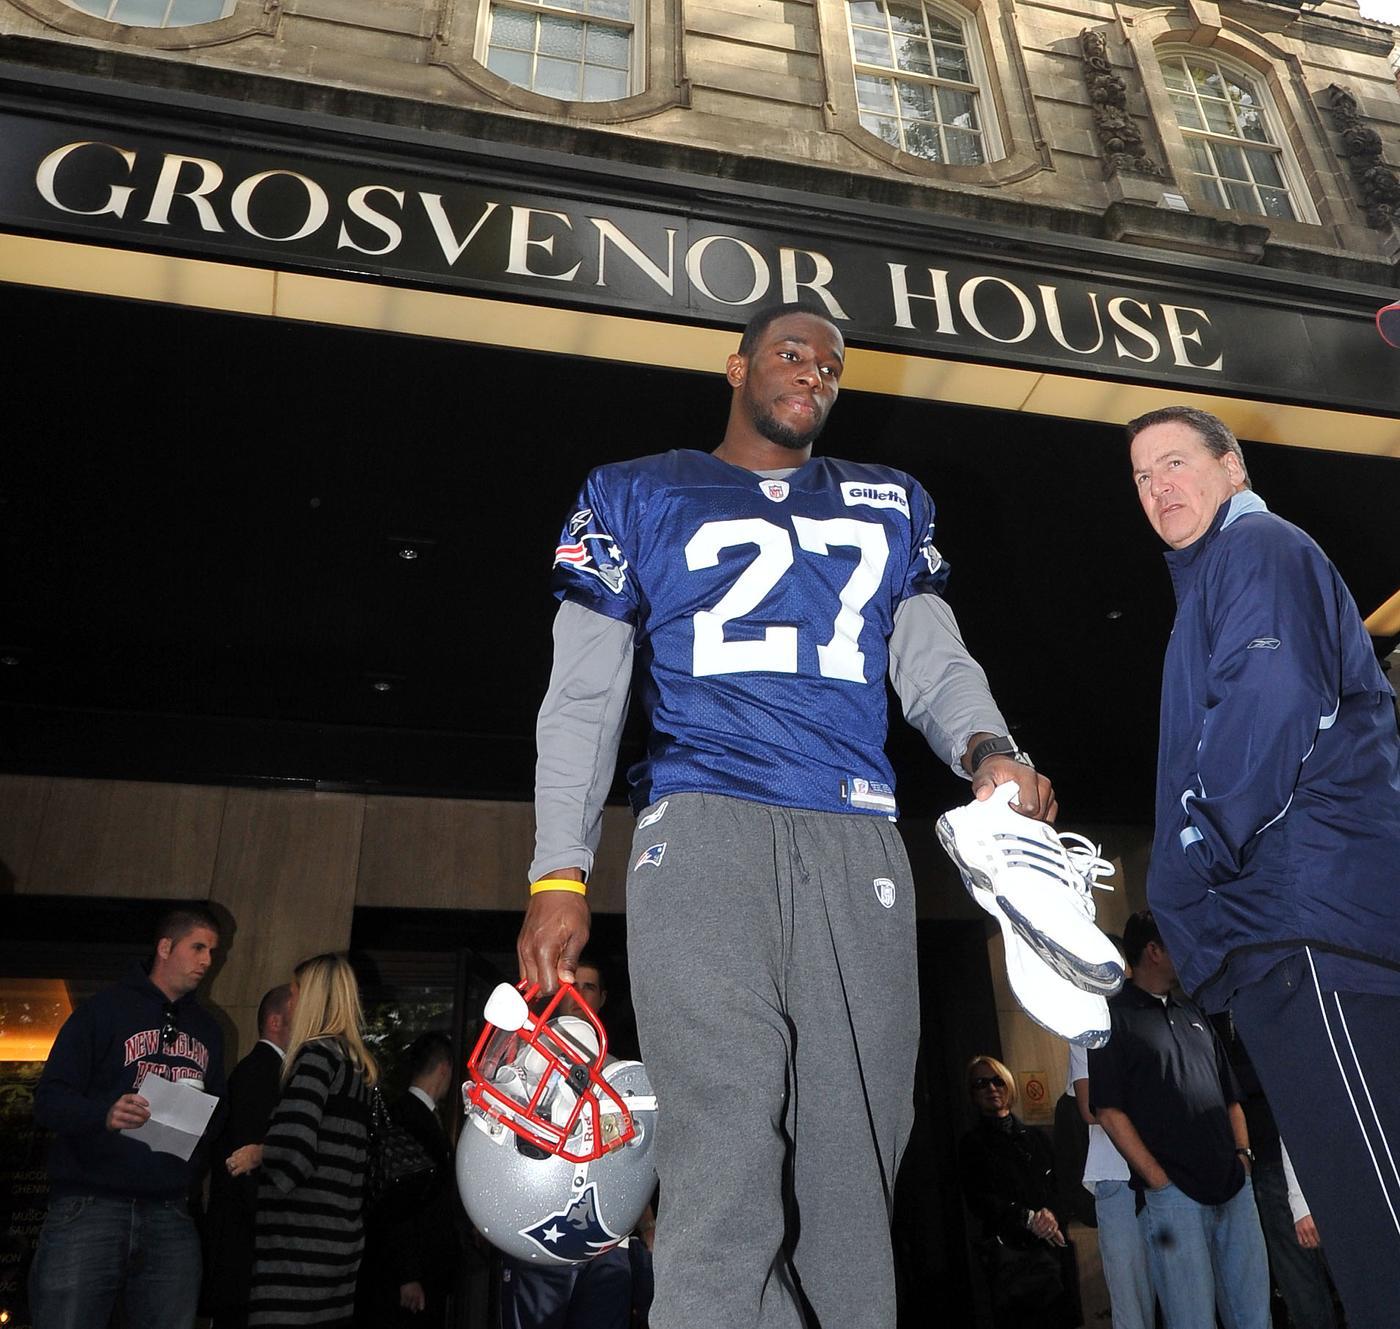 http://cachemediasrv.patriots.com/ImgDyn.cfm?s=Patriots_Cheerleaders-014.jpg&c=1&w=500&cs=1